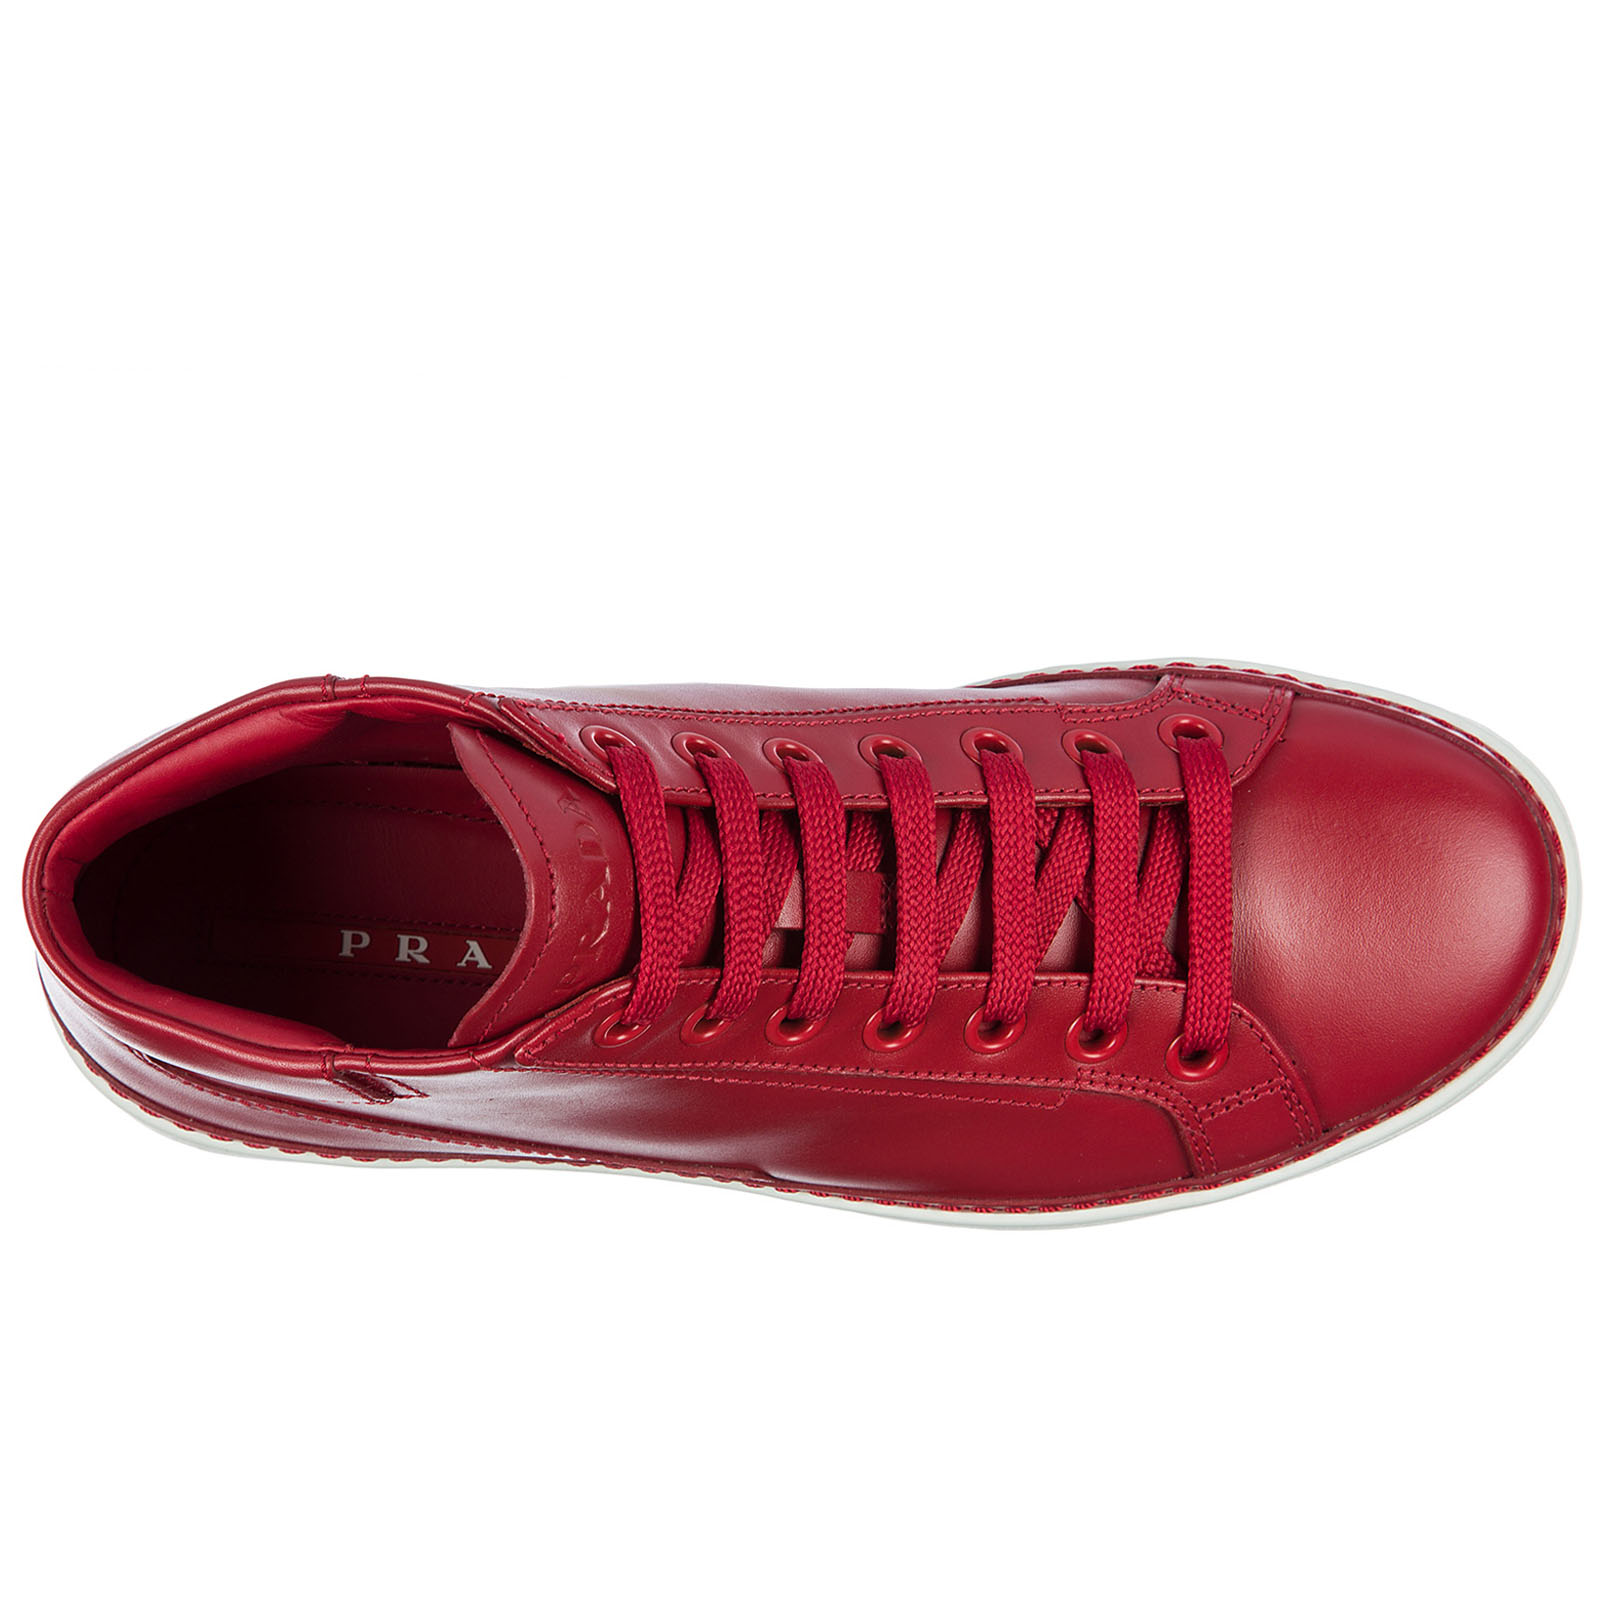 ... Scarpe sneakers alte uomo in pelle ... d5d6c53e9d9